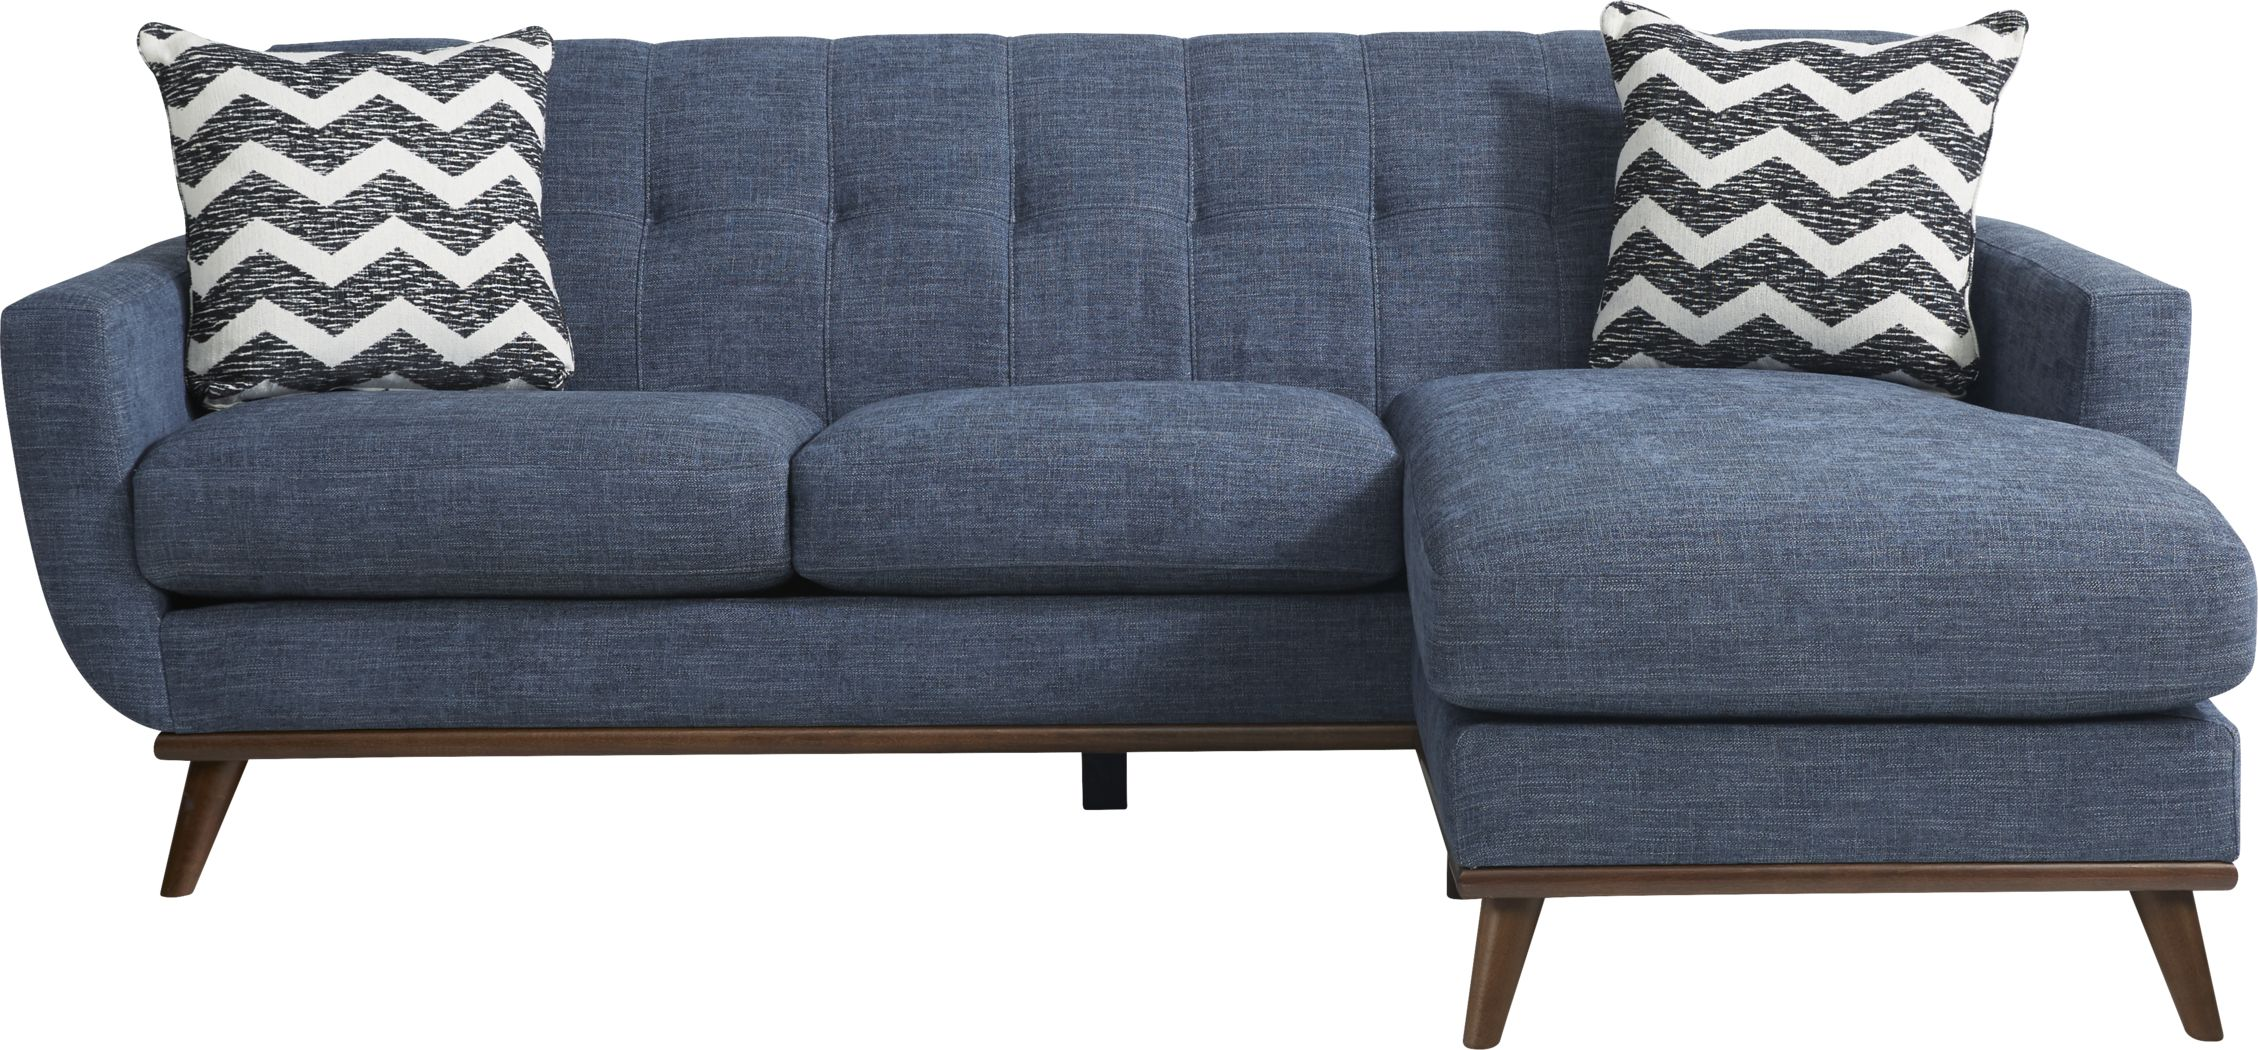 East Side Sapphire Chaise Sofa